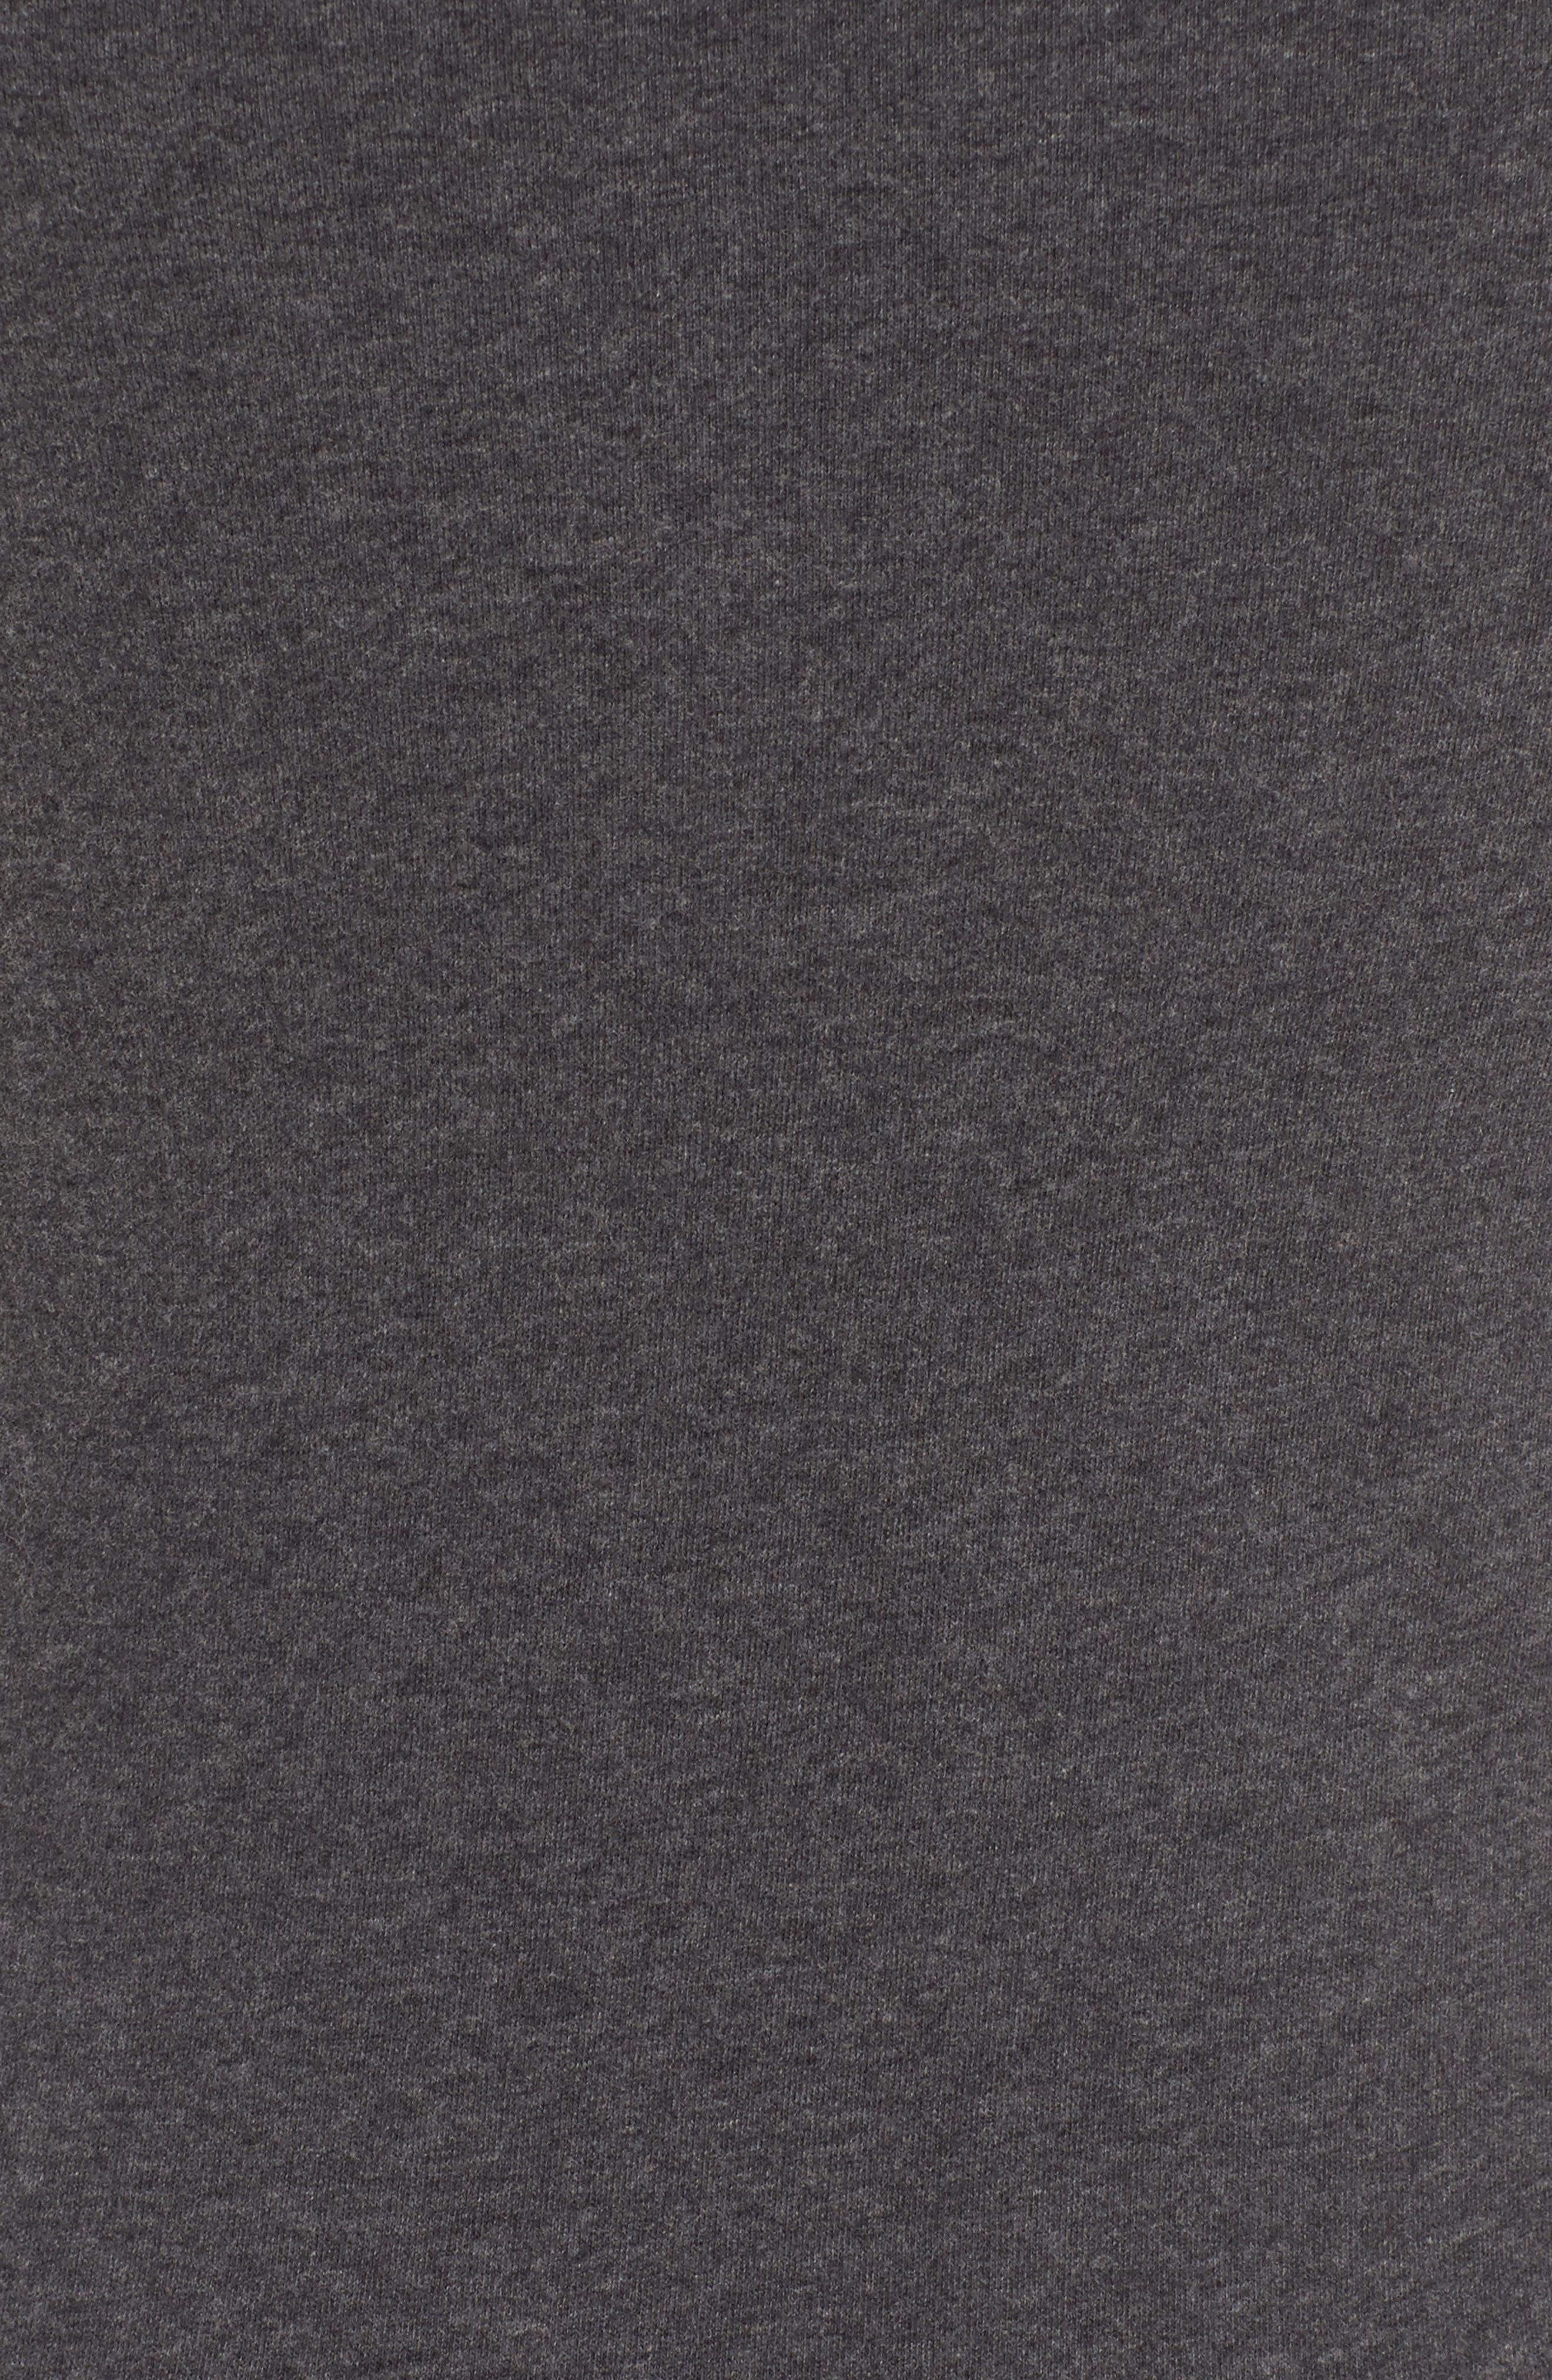 Alternate Image 5  - James Perse Brushed Jersey Tee